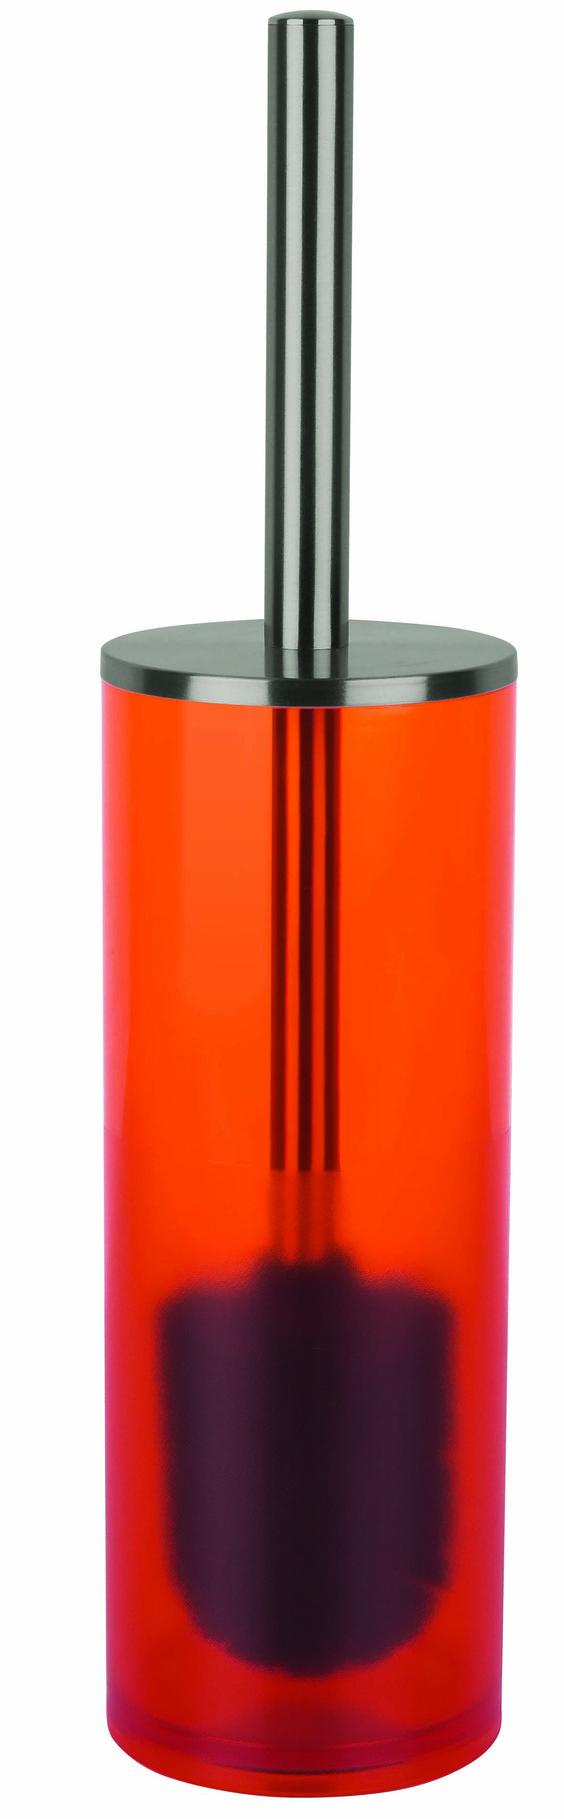 #Spirella Orange Nyo Toilet Brush